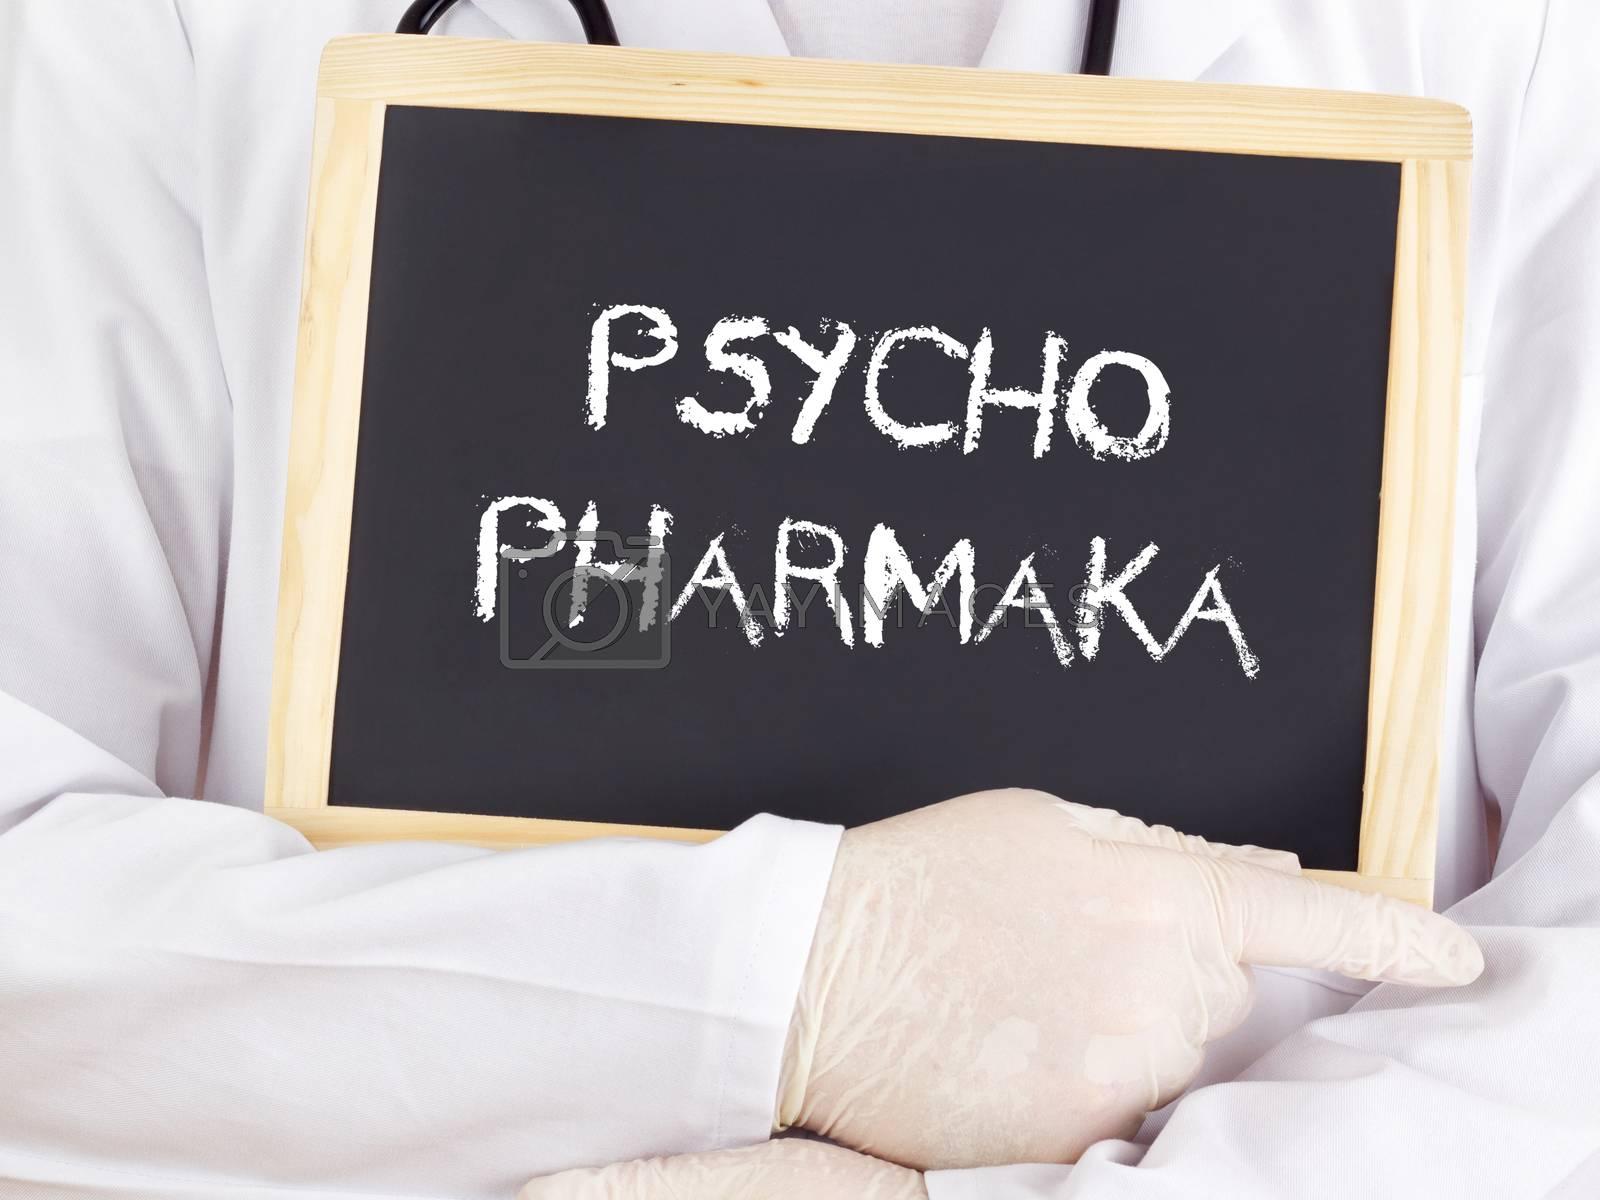 Doctor shows information: psychiatric medication in german